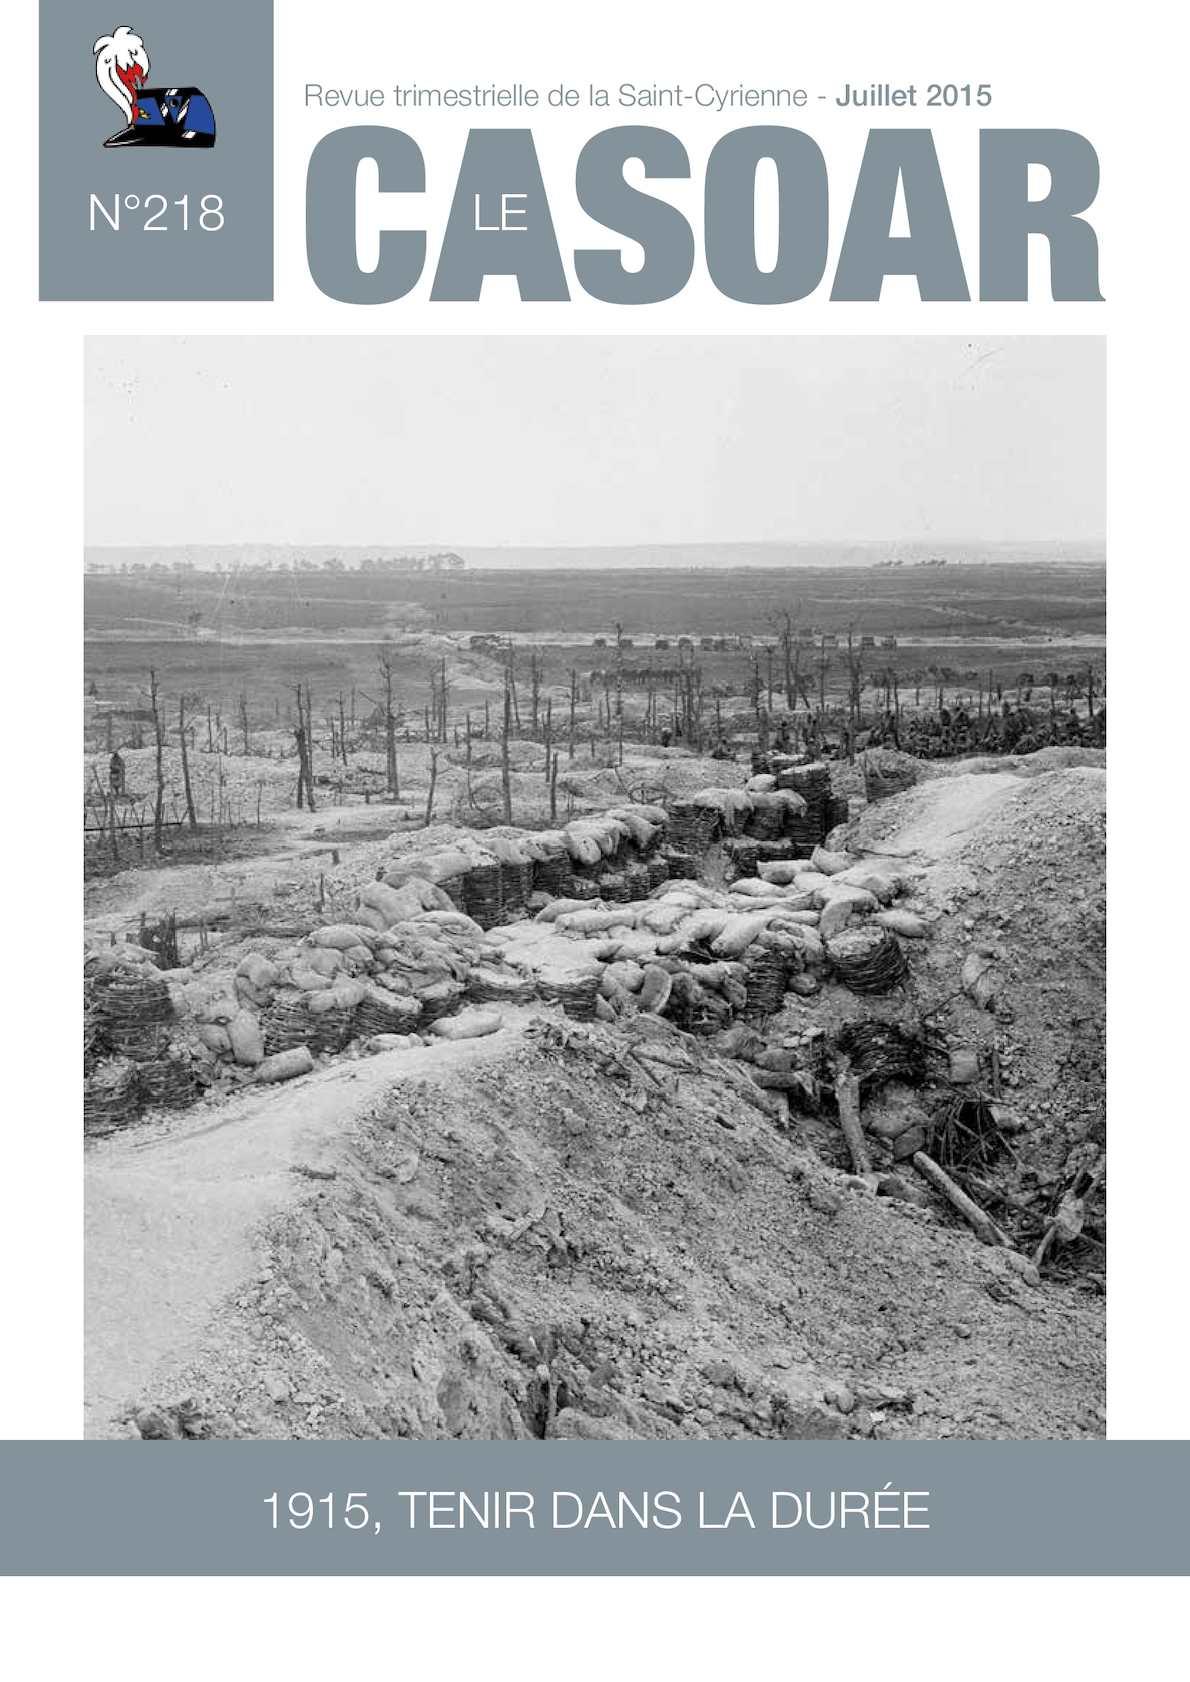 EPOPEE LECLERC AU SAHARA TARAWA GUERRE EN MALAISIE TROUPES D/'ELITE n° 54